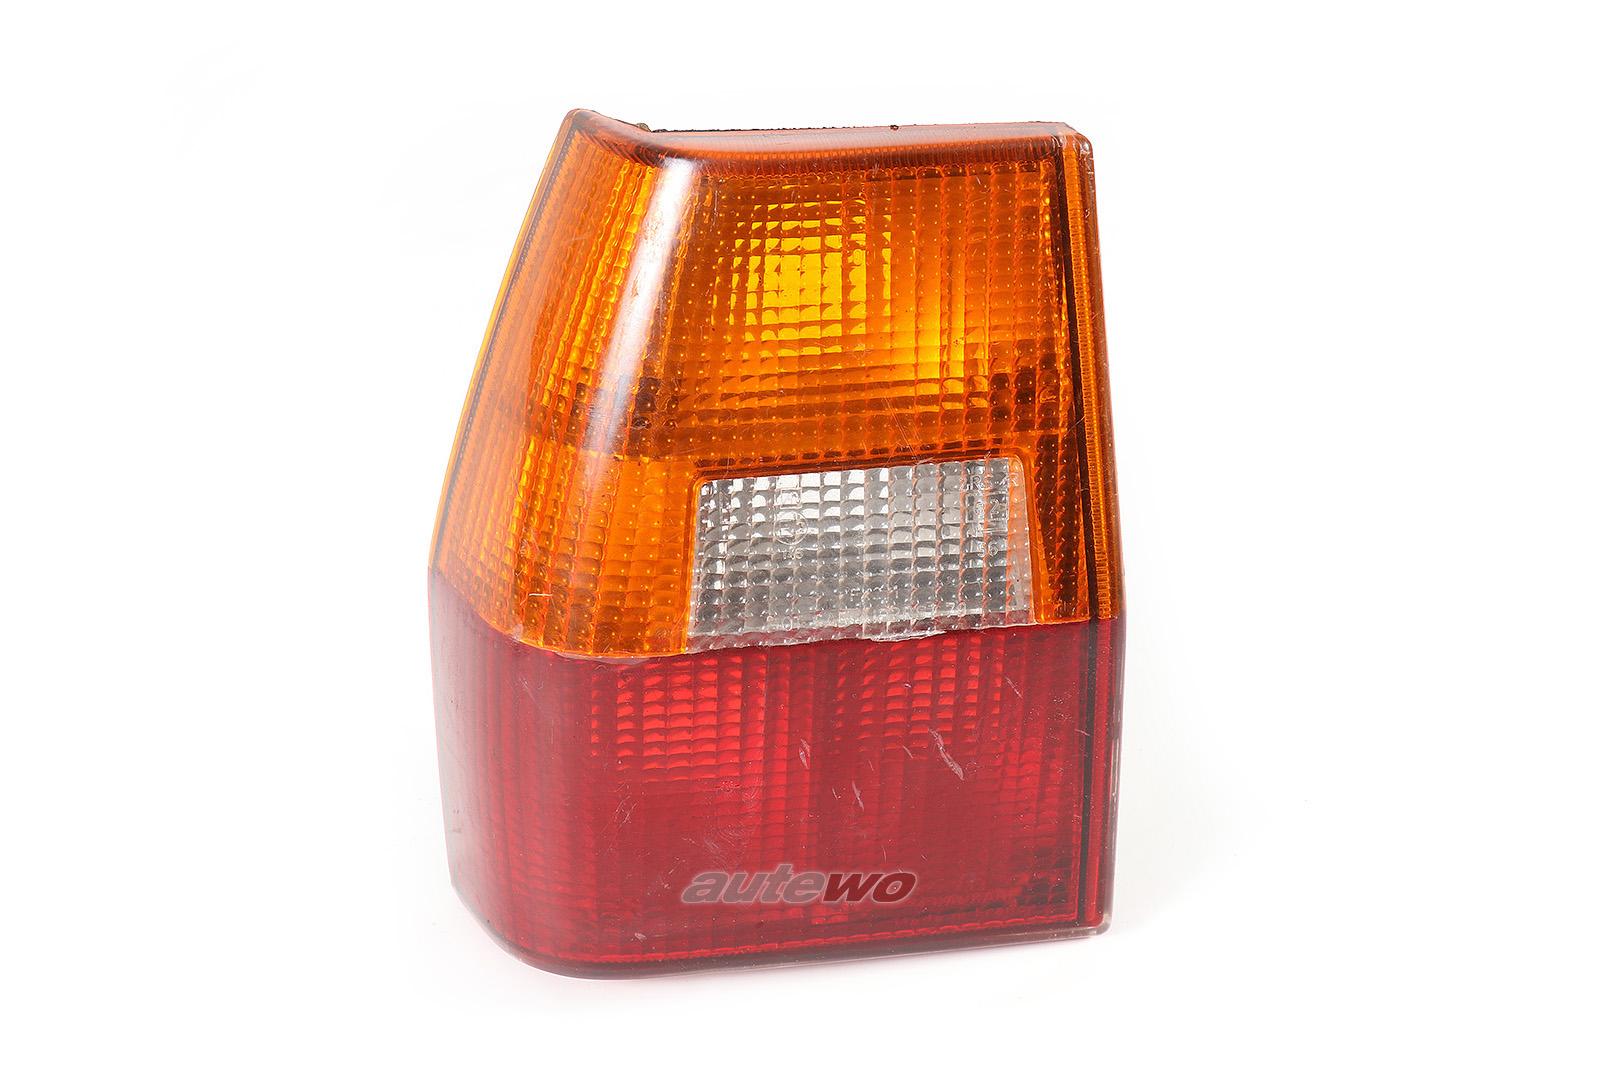 855945217 Audi Coupe Typ 81/85/Urquattro Rücklicht/Blinker Hinten Links